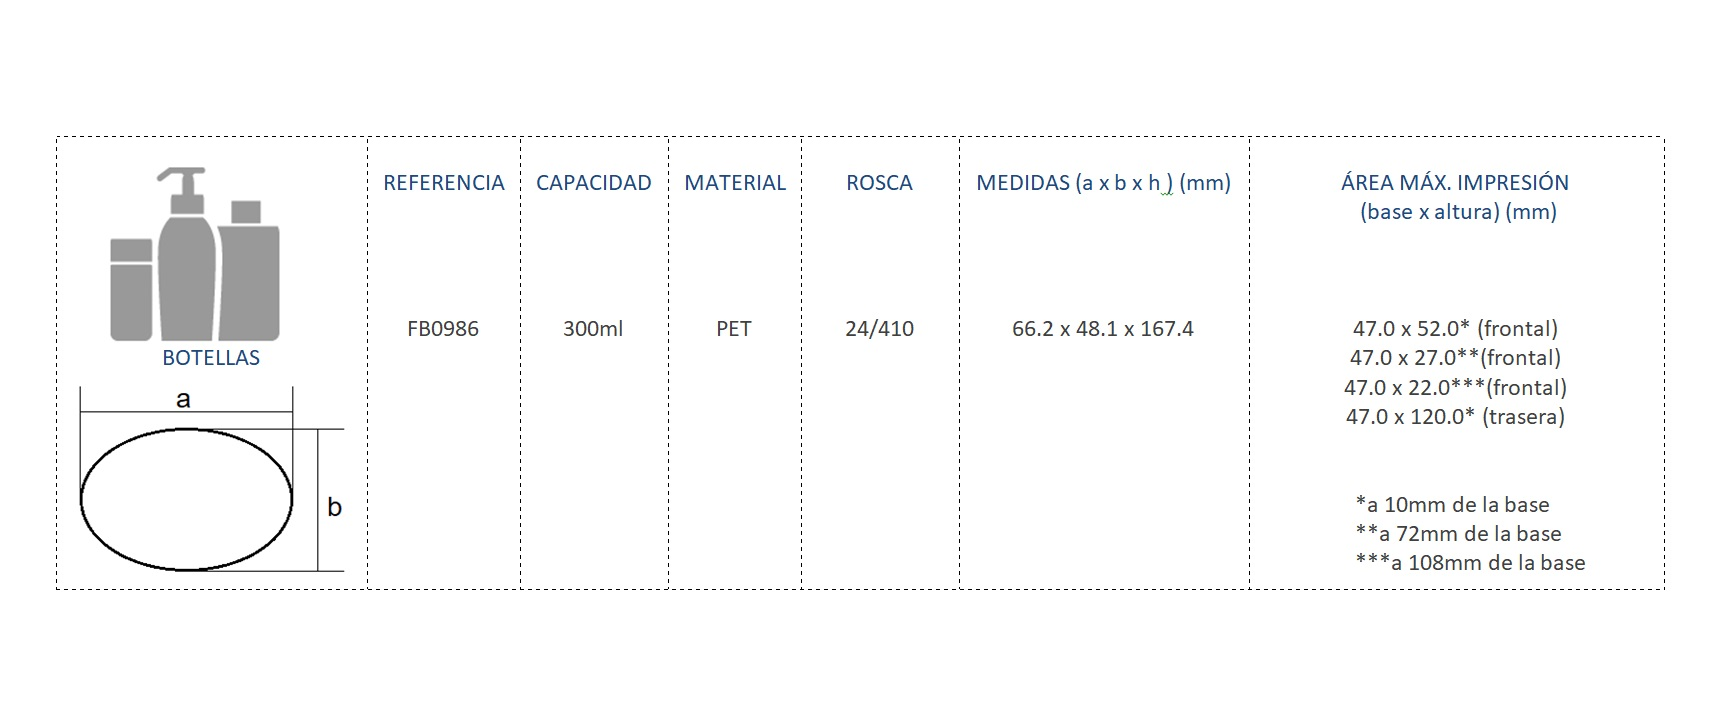 Cuadro de materiales botella FB0986